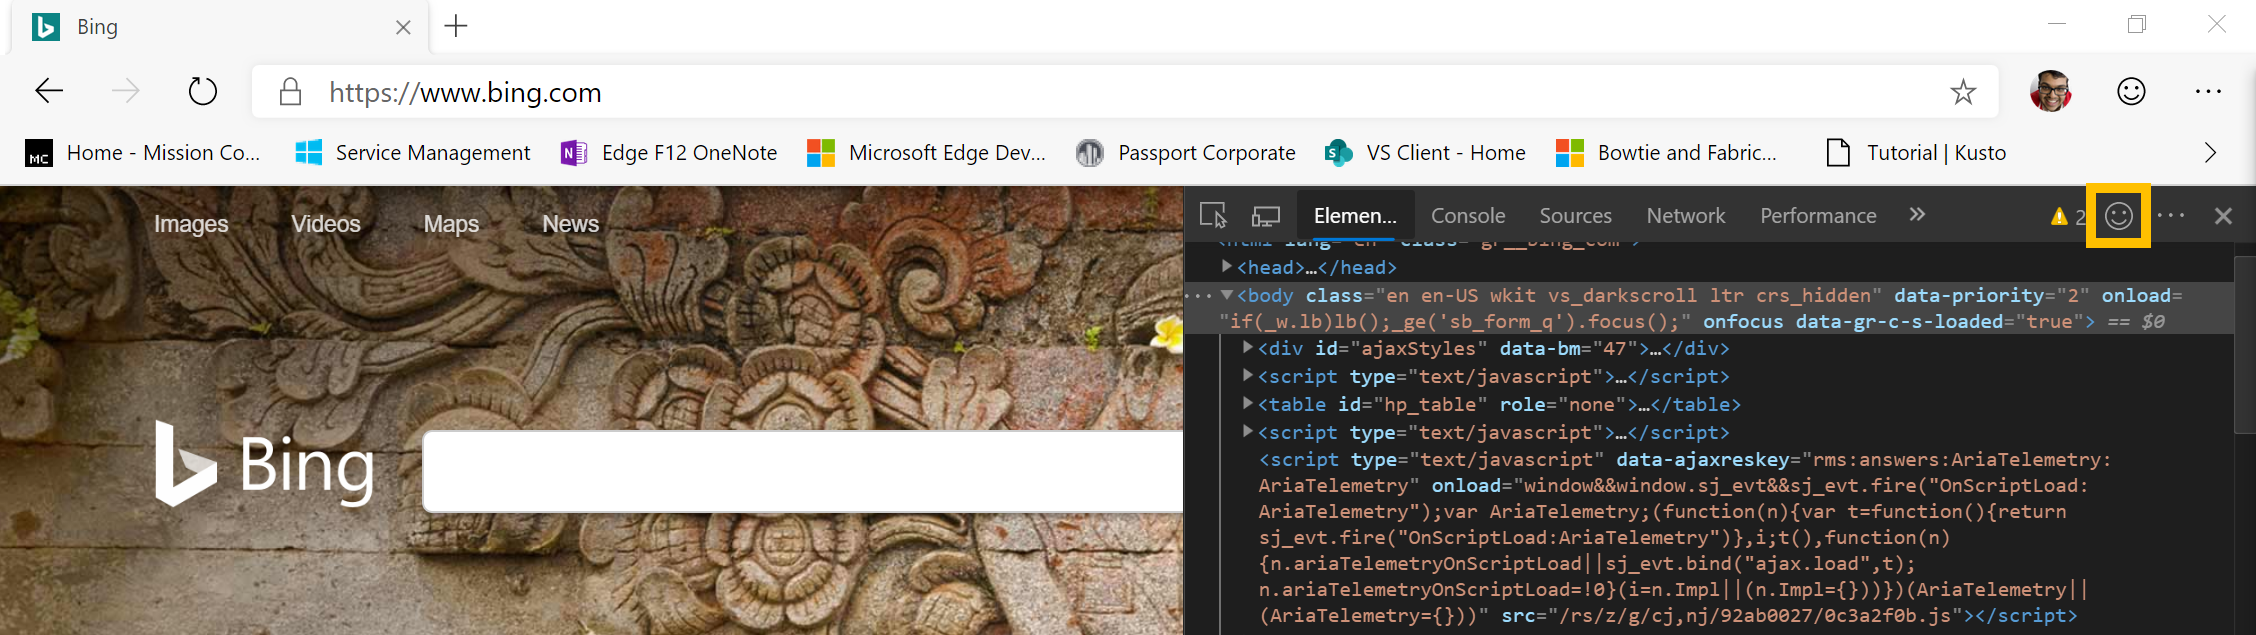 Microsoft Edge (Chromium) Developer Tools - Microsoft Edge